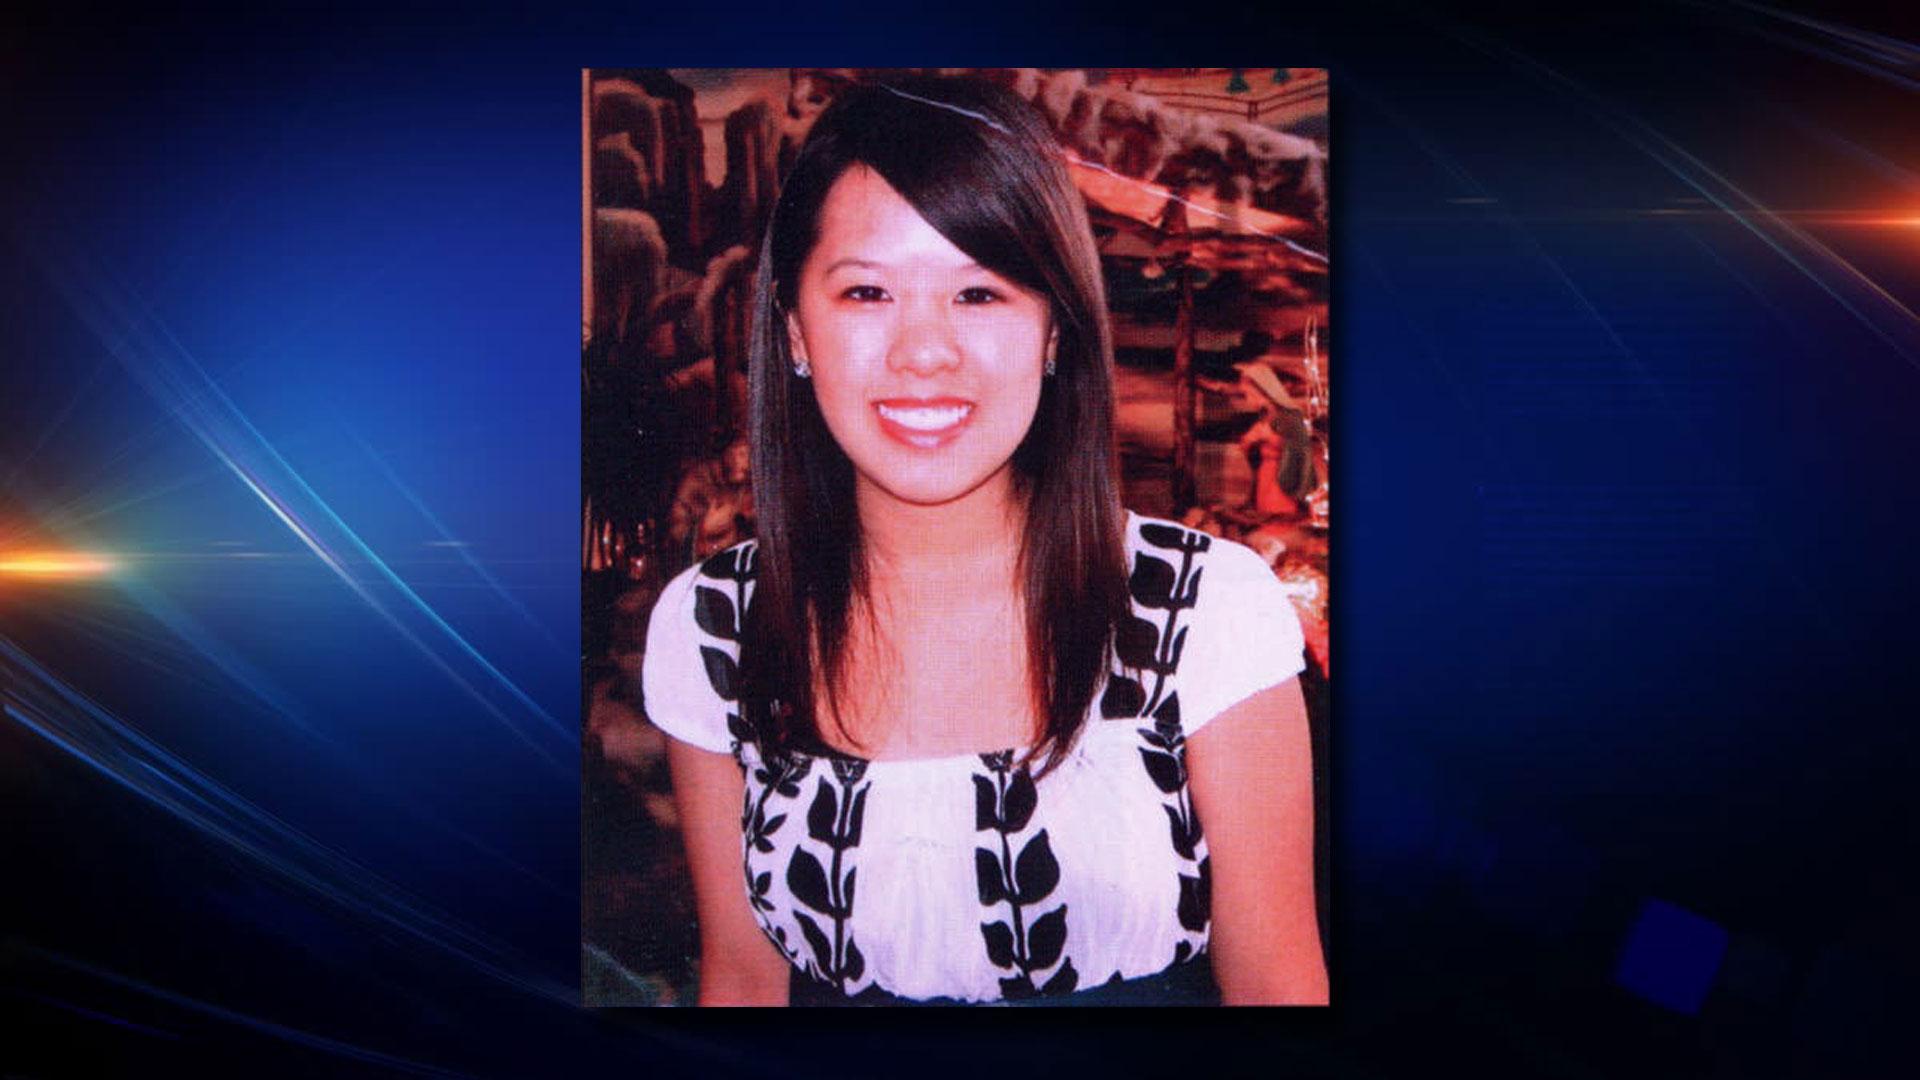 Nina Pham graduated from Texas Christian University in 2010 from the university's BSN Nursing program.